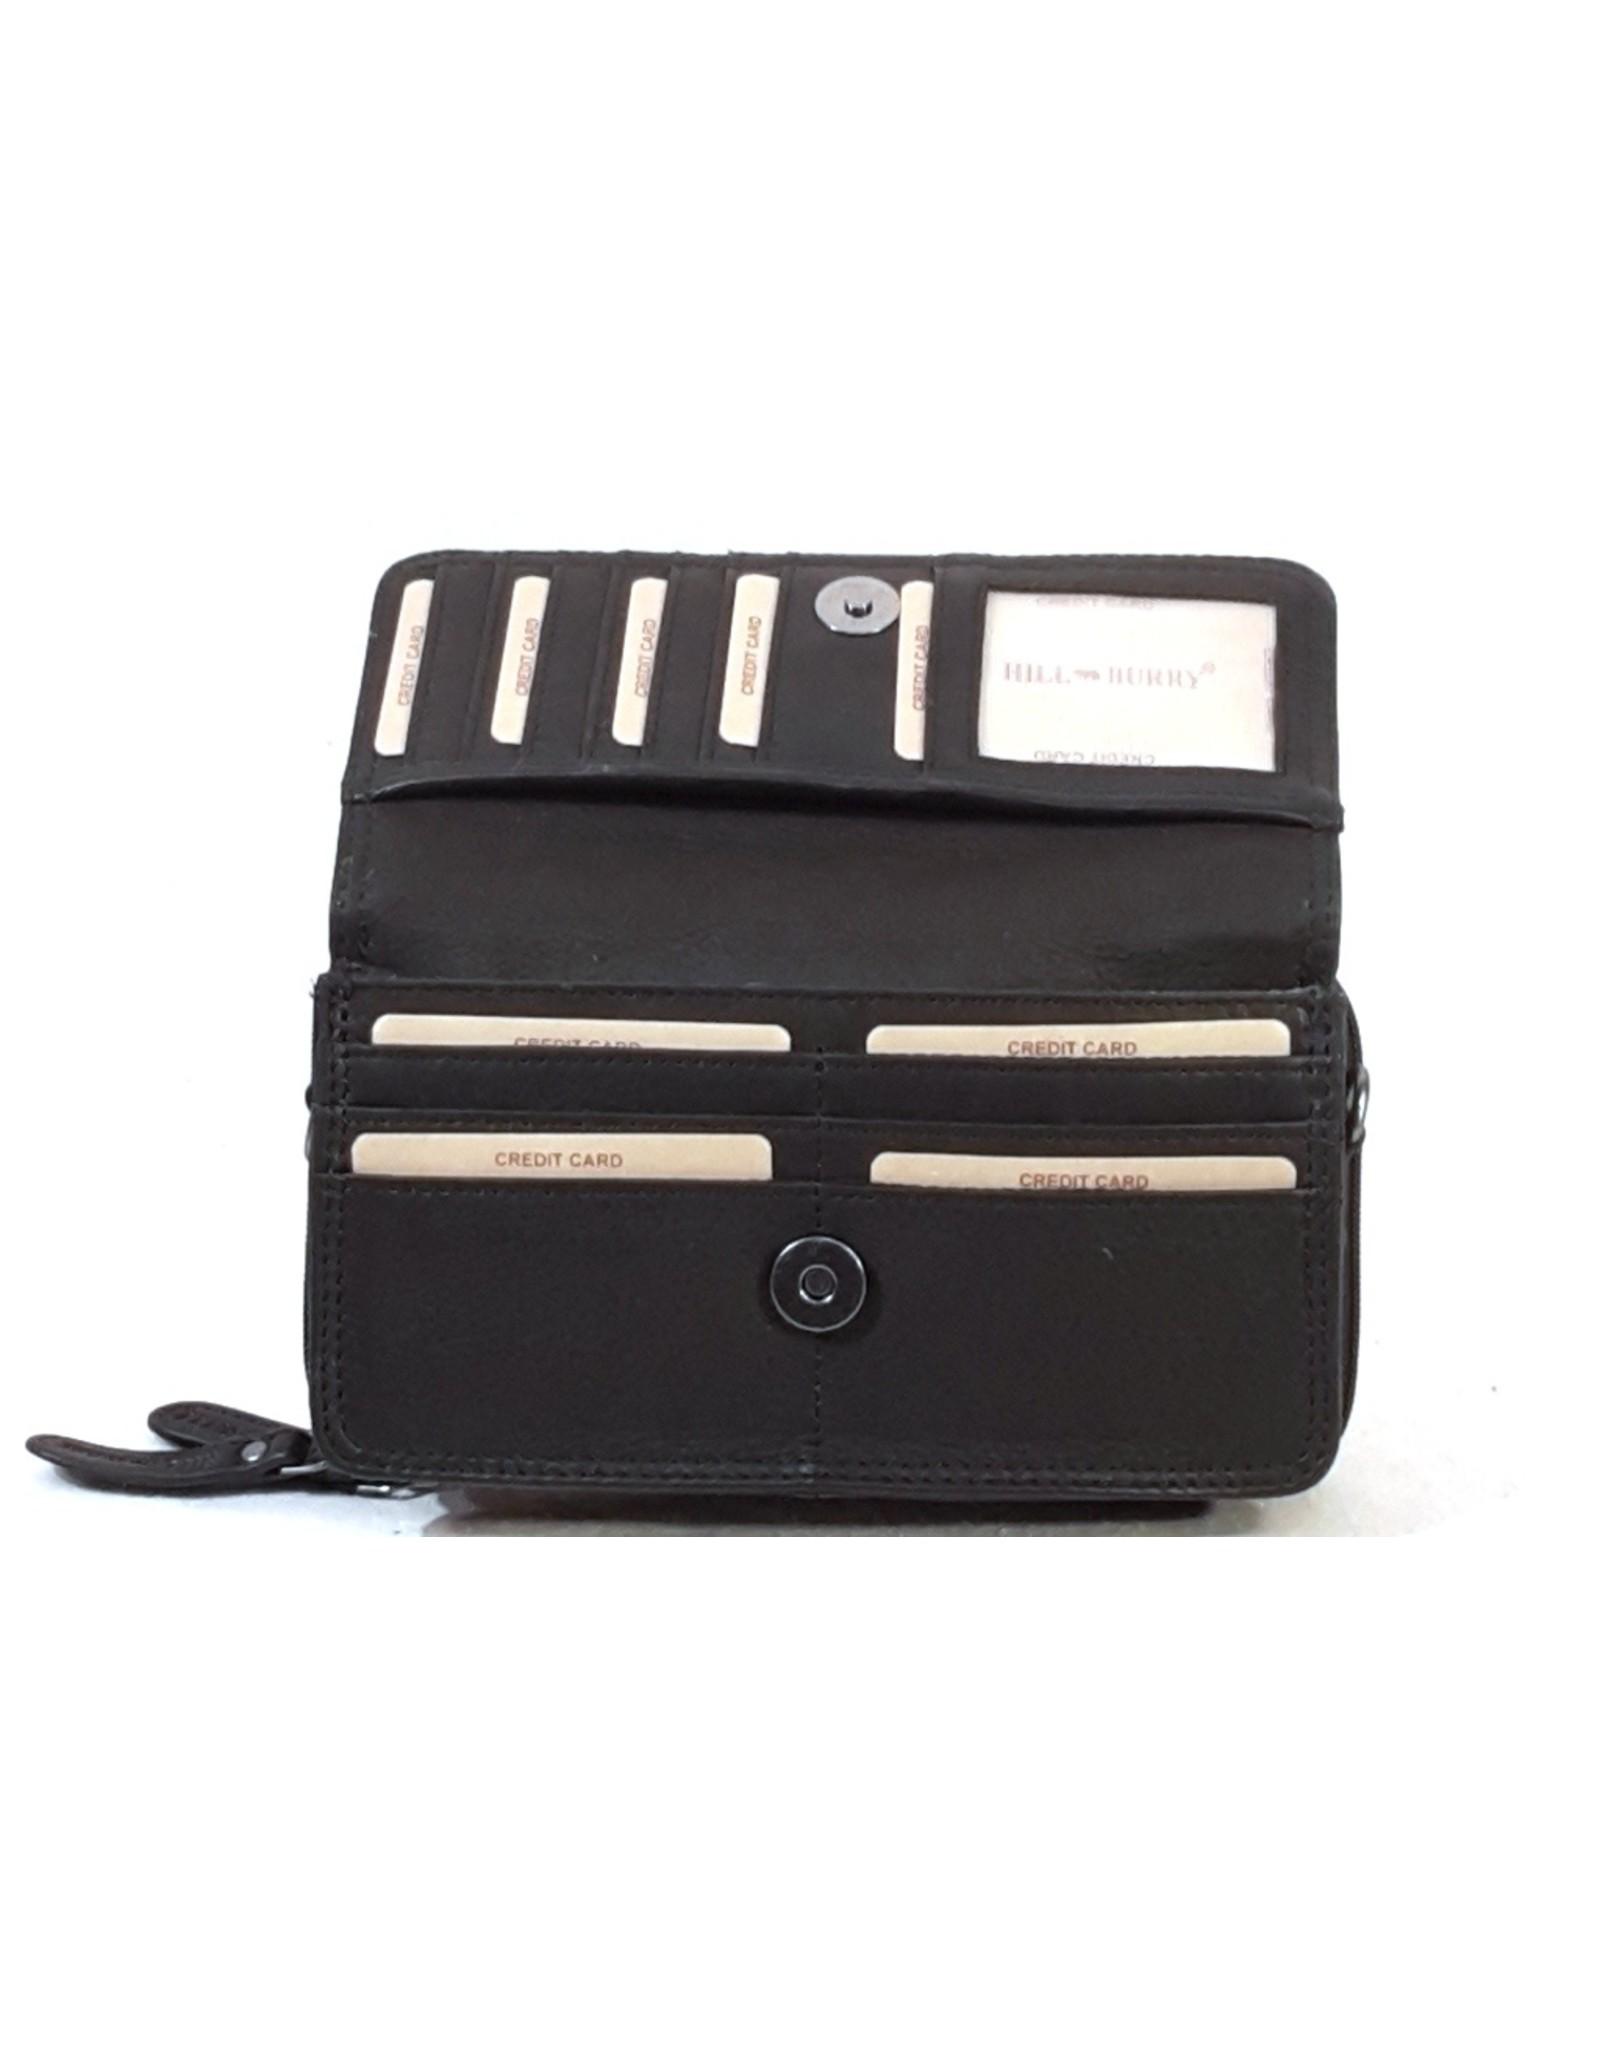 HillBurry Leather bags - HillBurry Leather Organizer bag (black)